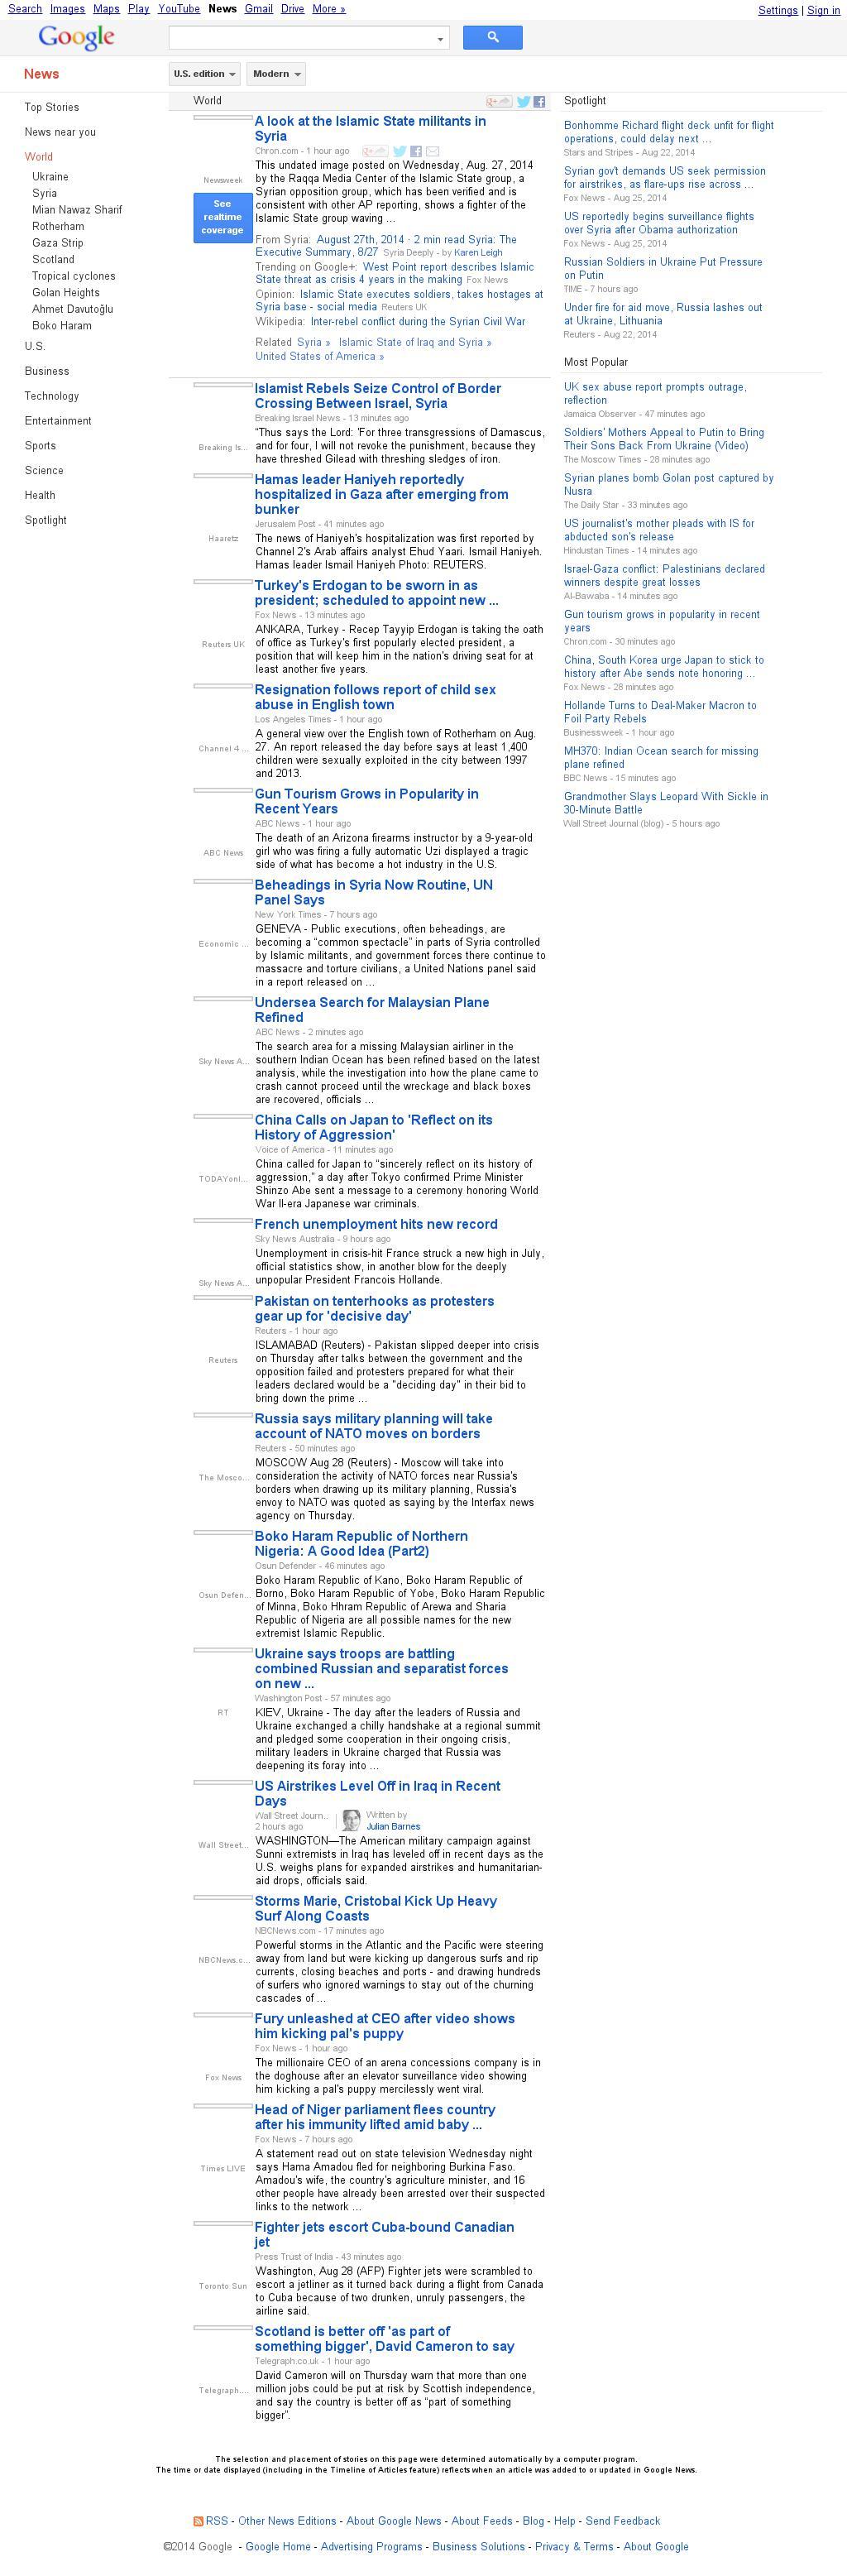 Google News: World at Thursday Aug. 28, 2014, 7:07 a.m. UTC